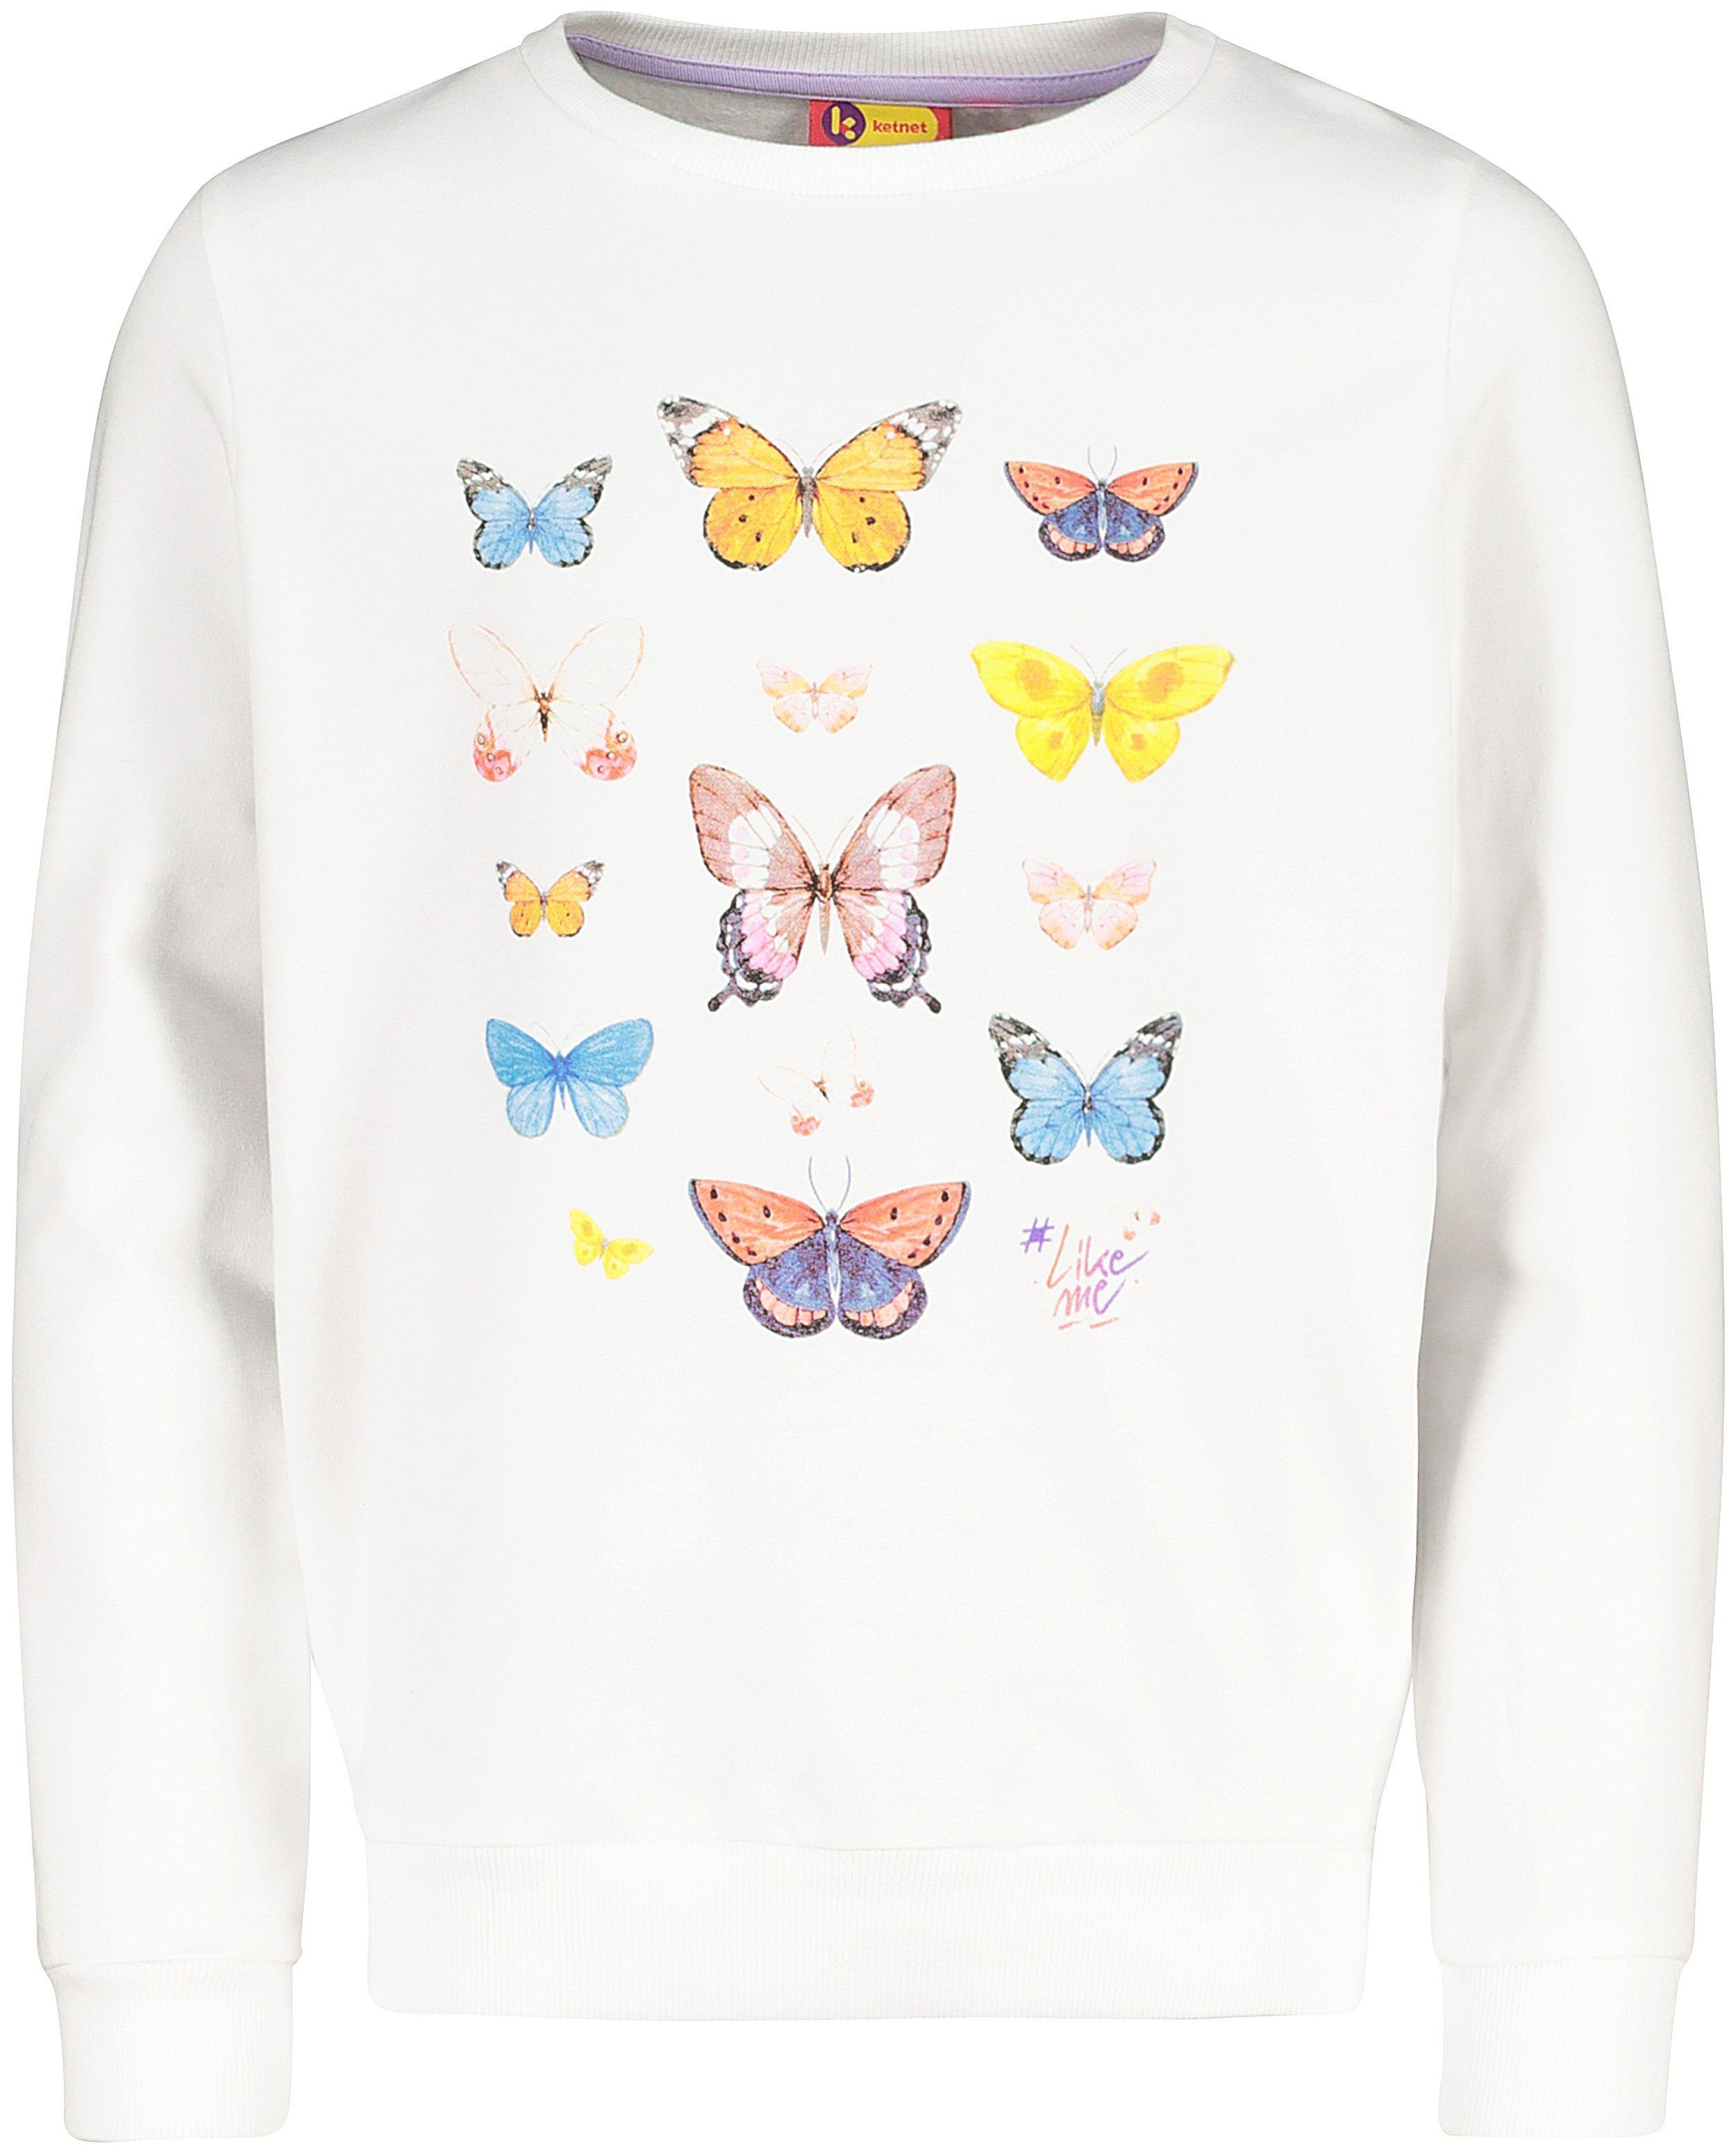 Witte sweater met print #LikeMe